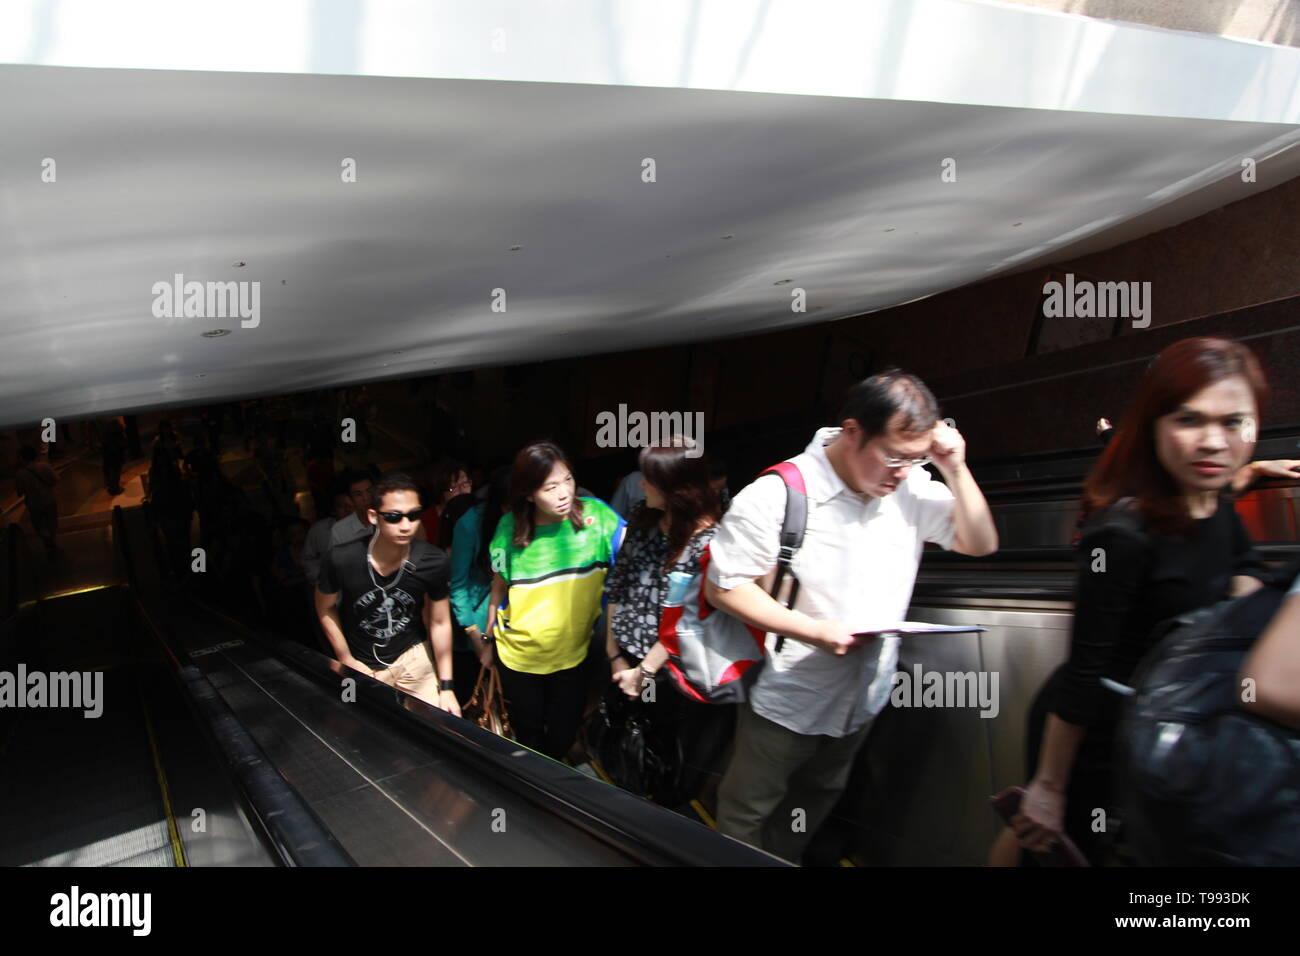 Singapore Mass Rapid Transit, (MRT) underground metro system Stock Photo